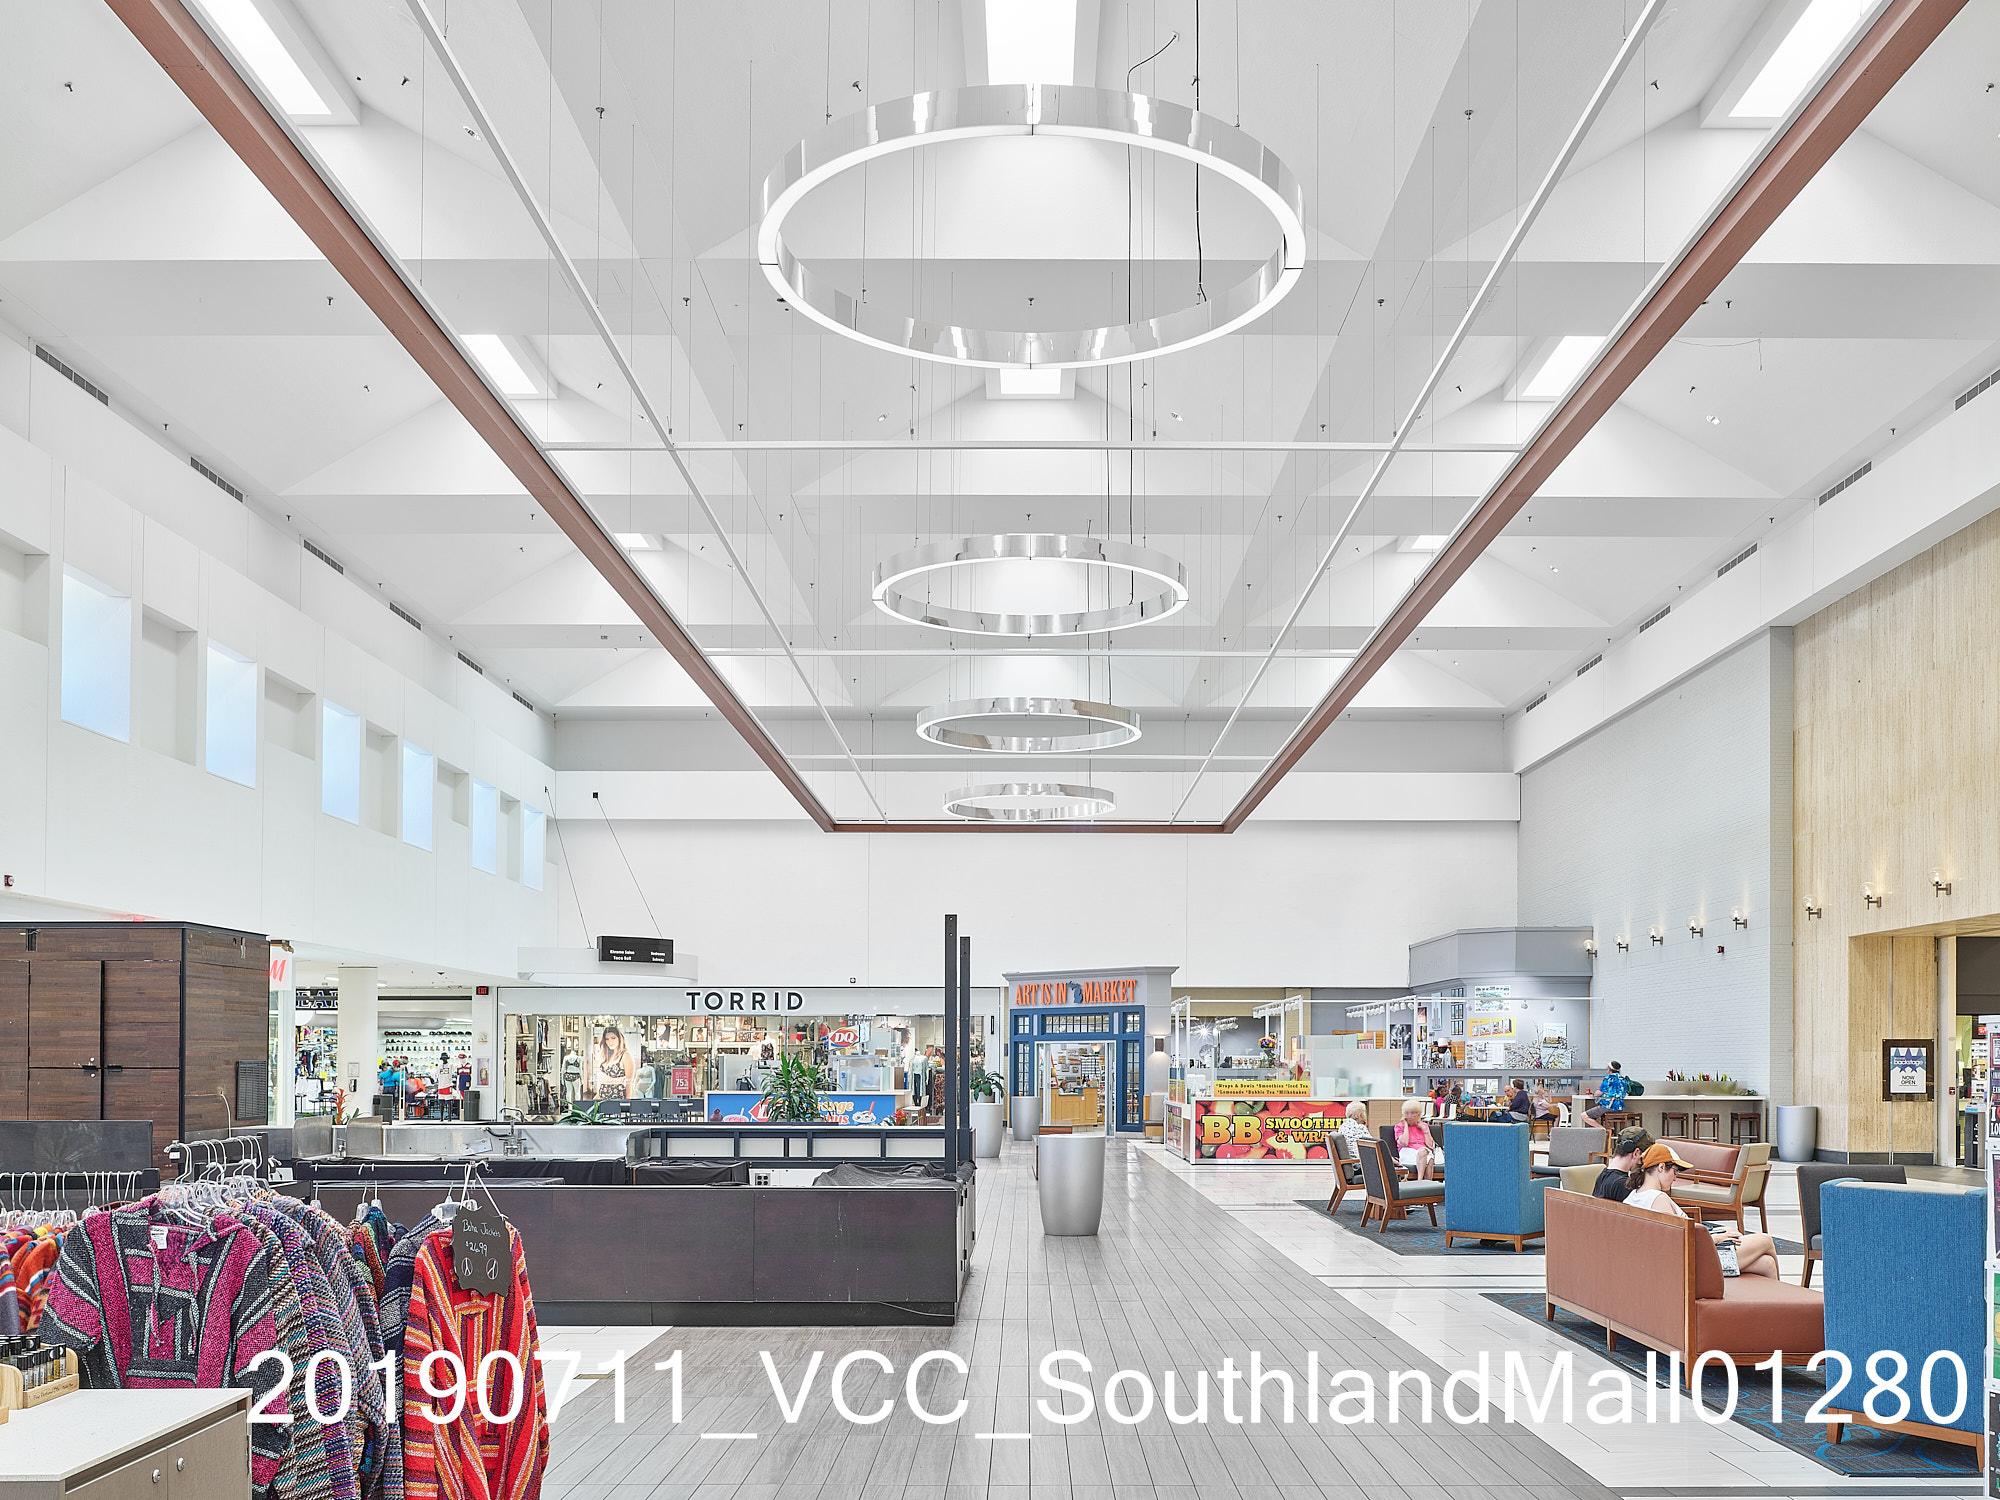 20190711_VCC_SouthlandMall01280.jpg